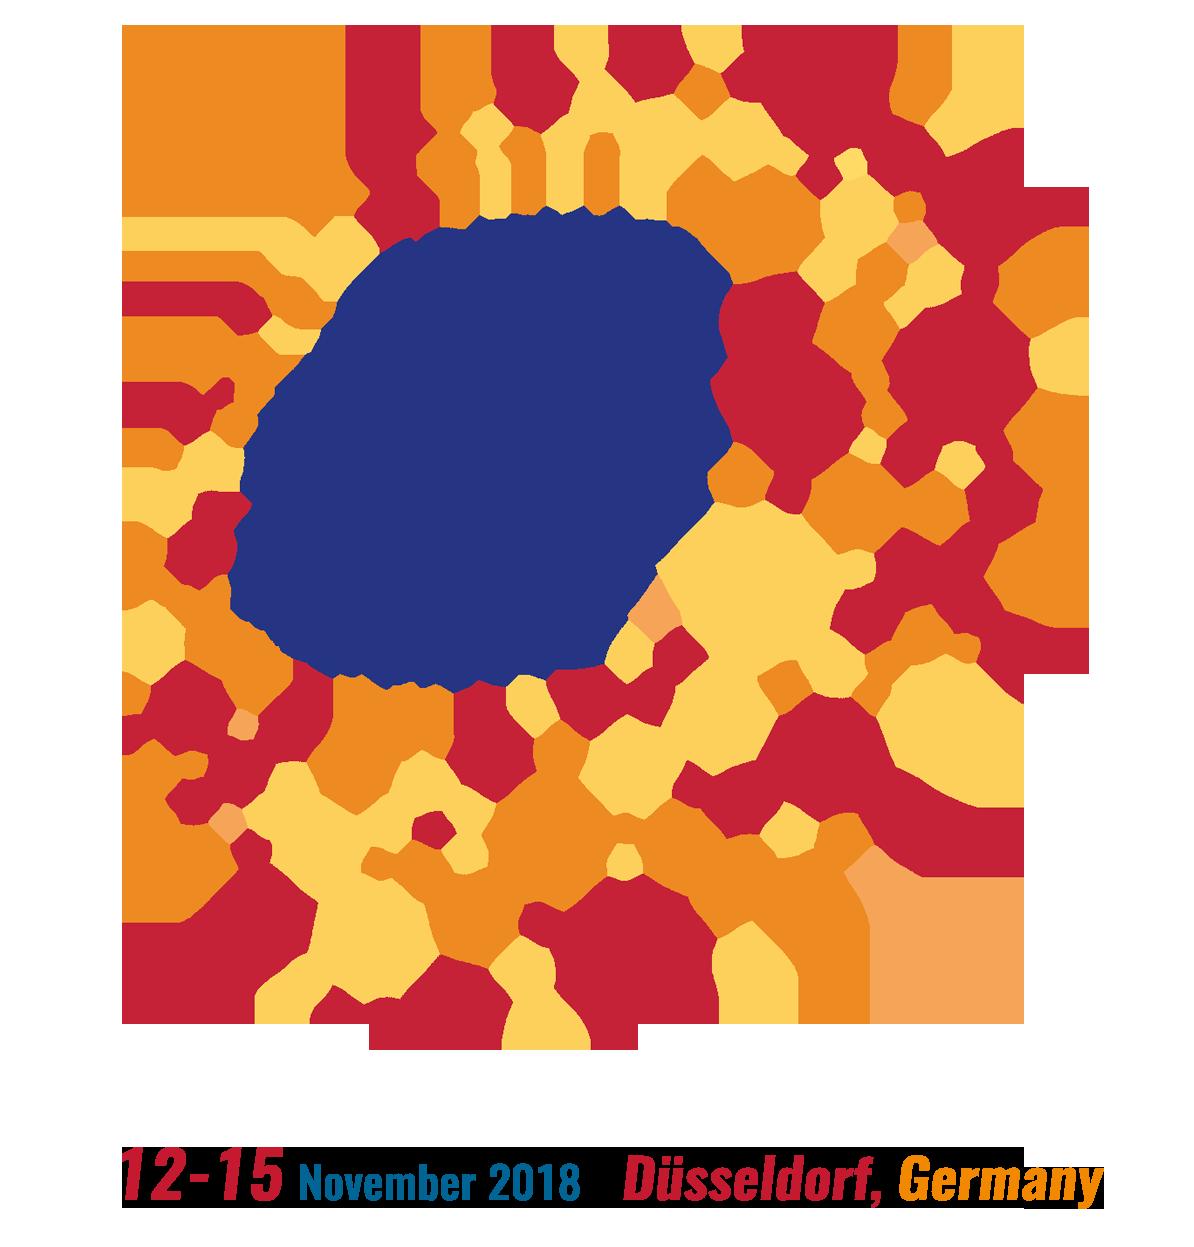 The Spanish Companies Medica 2018   HISTOCELL REGENERATIVE MEDICINE